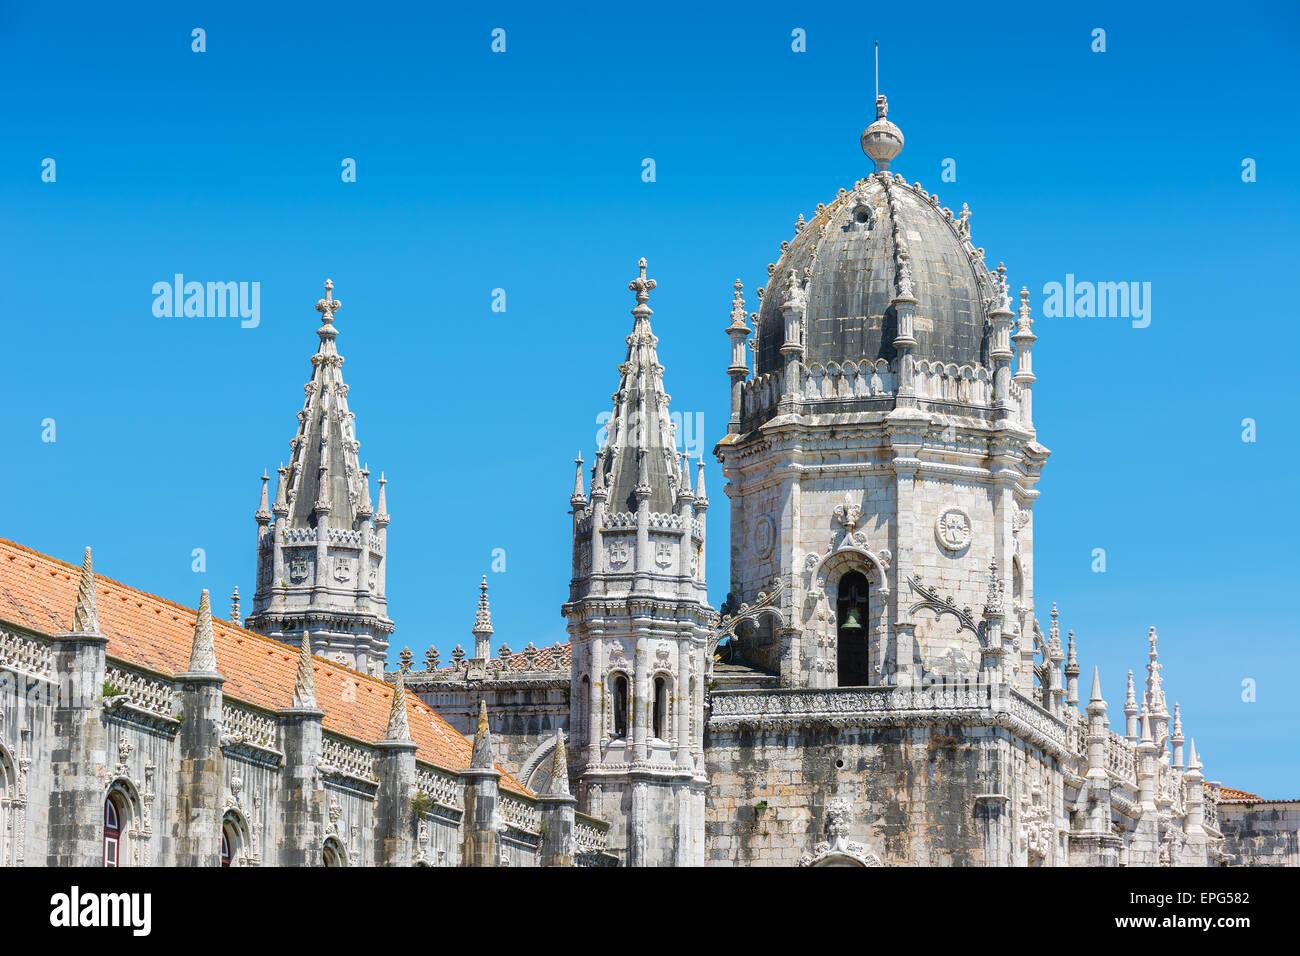 View of the Jeronimos Monastery Lisbon Portugal - Stock Image